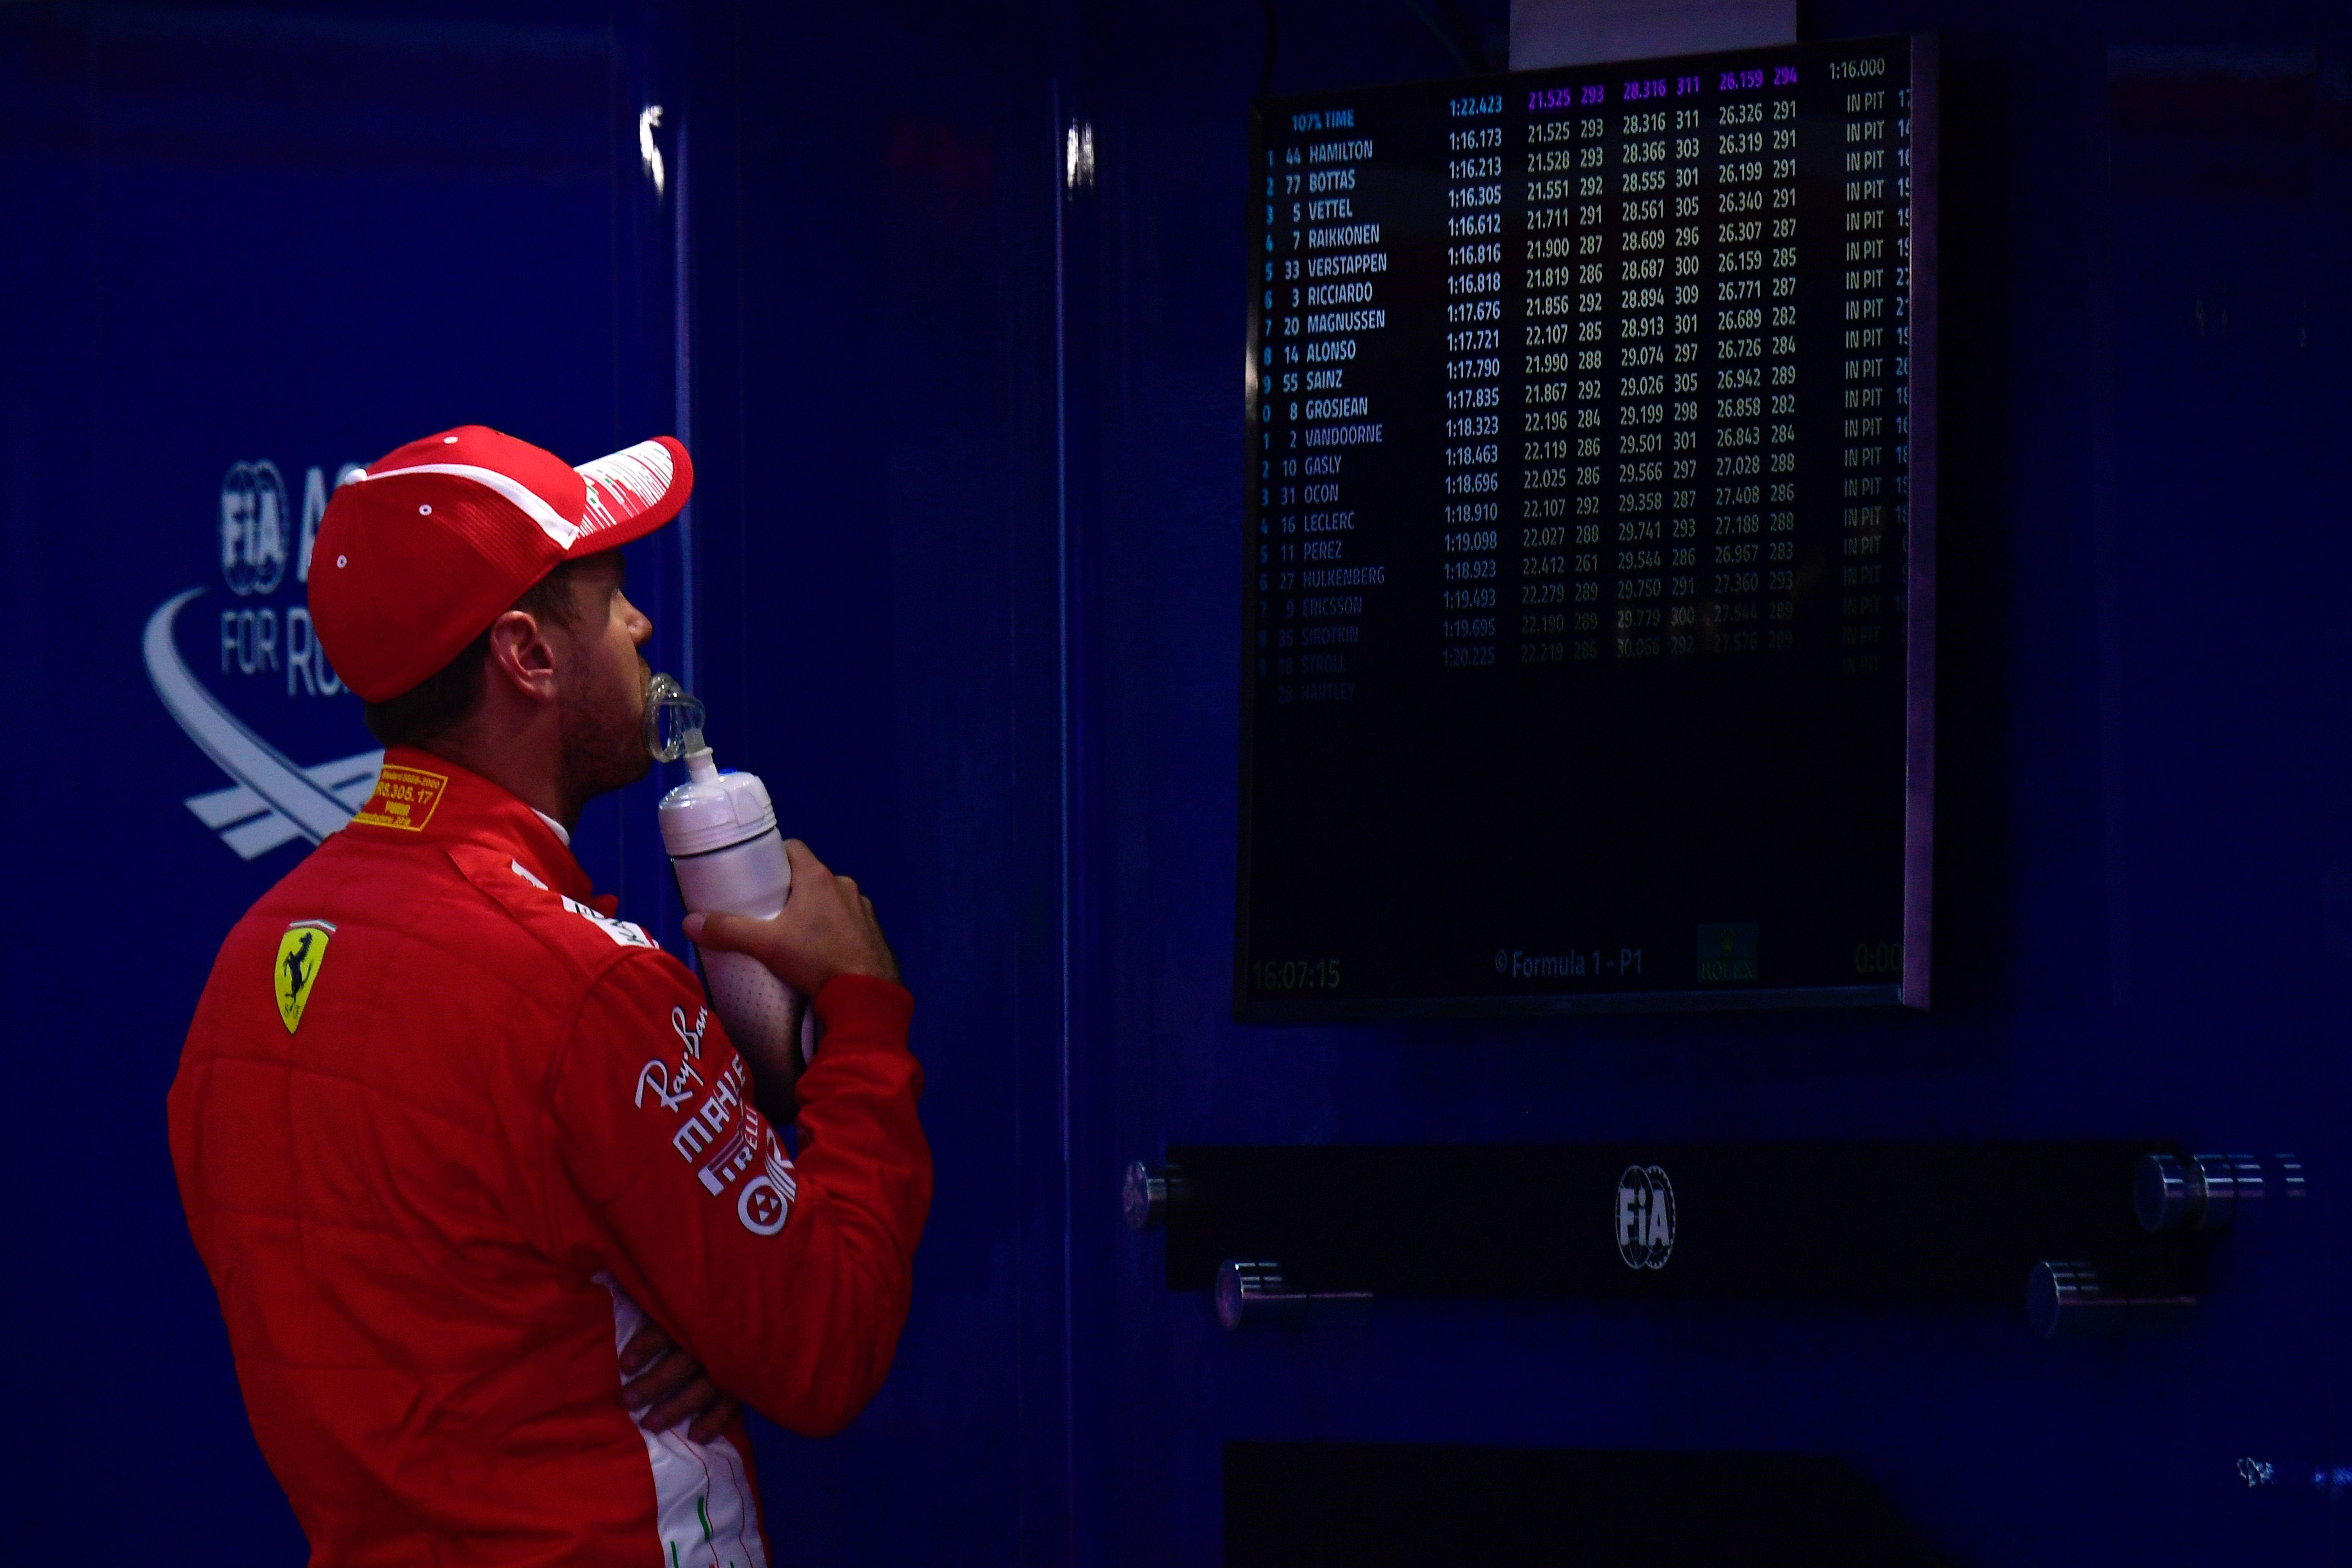 Sebastian Vettel (Ferrari) au Grand Prix d'Espagne 2018